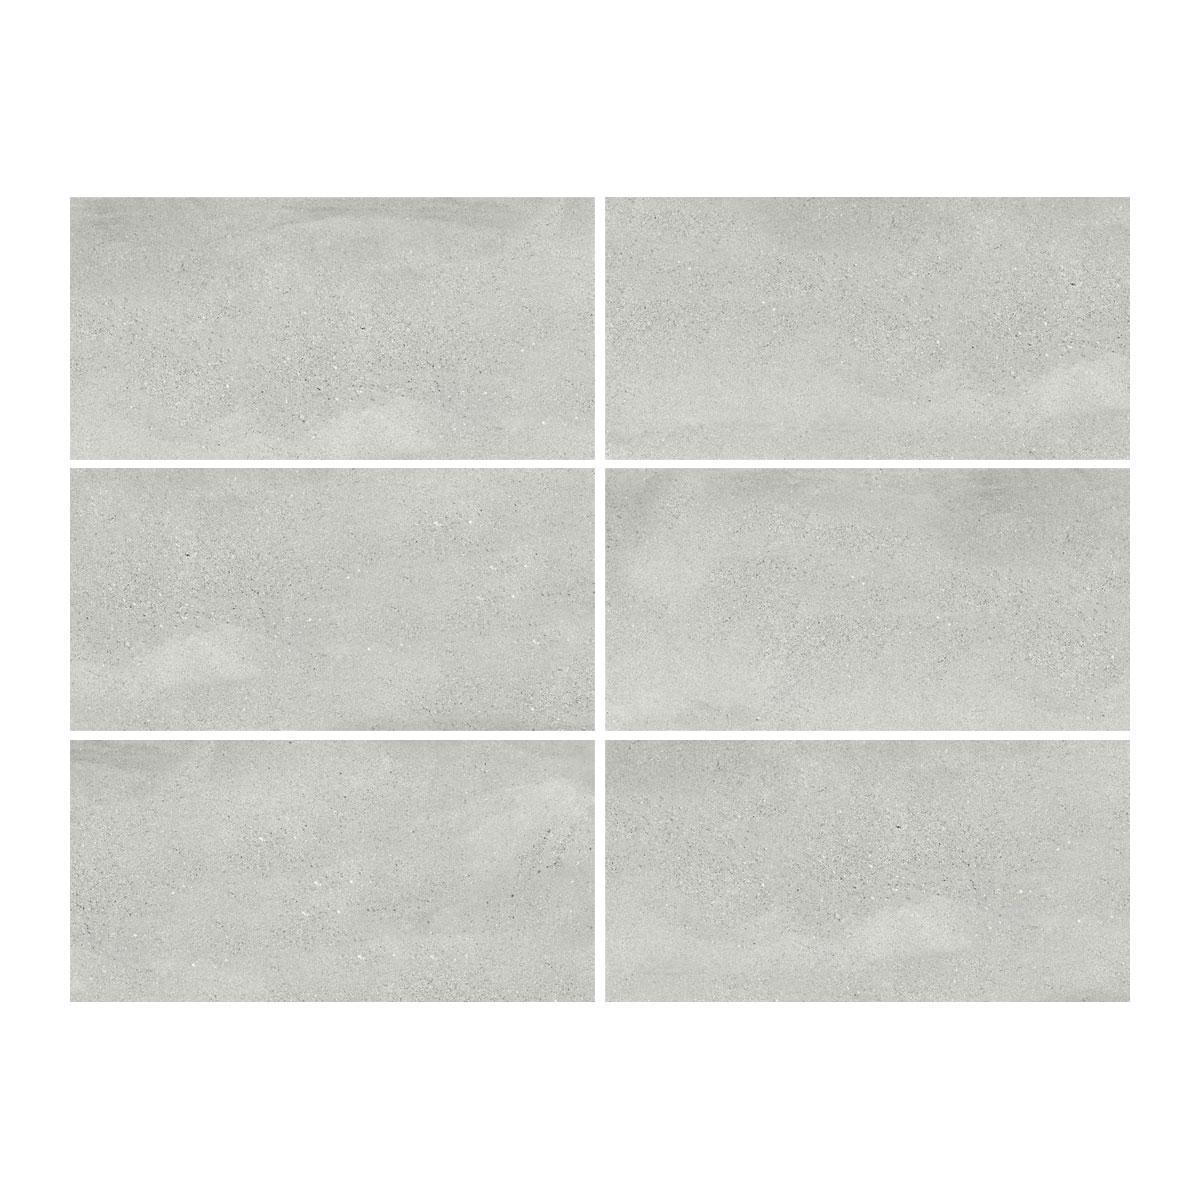 Moonstone - Pumice - Concrete Look Tiles - 300x600mm - Stone3